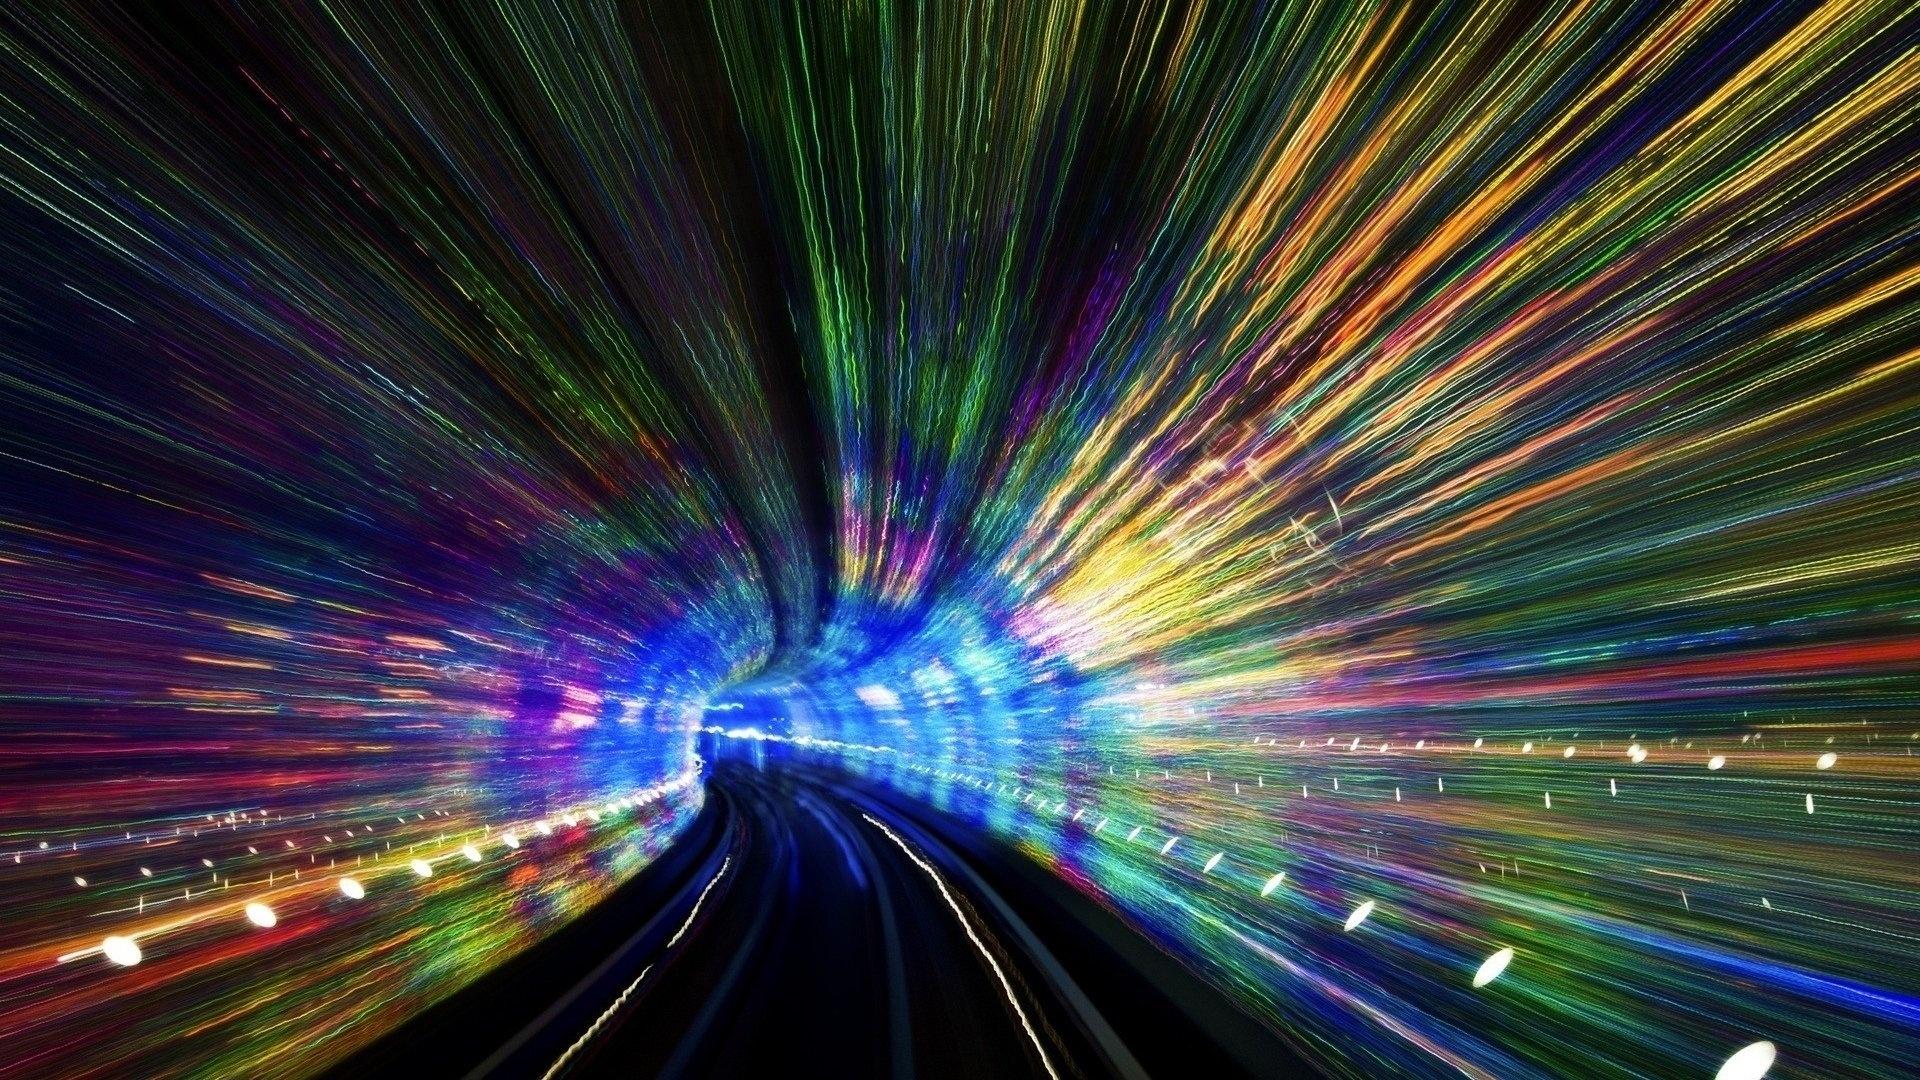 Space Tunnel HD Wallpaper